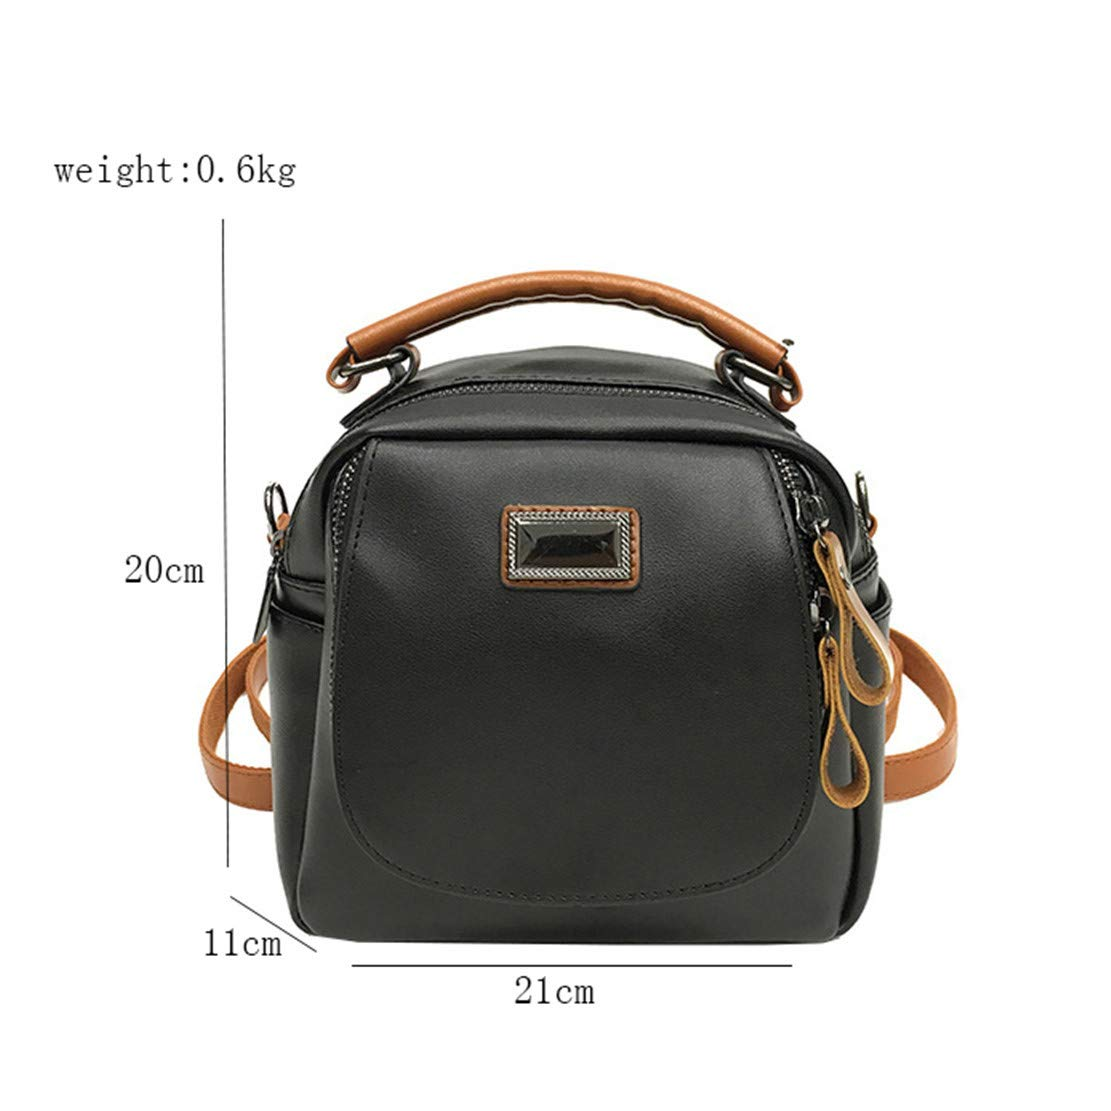 dd3ec264019ec Pteng Henkel Rucksack Damen Mini Rucksäcke Elegant Daypacks Outdoor Lässig  Backpack Wasserdicht Handtasche  Amazon.de  Koffer